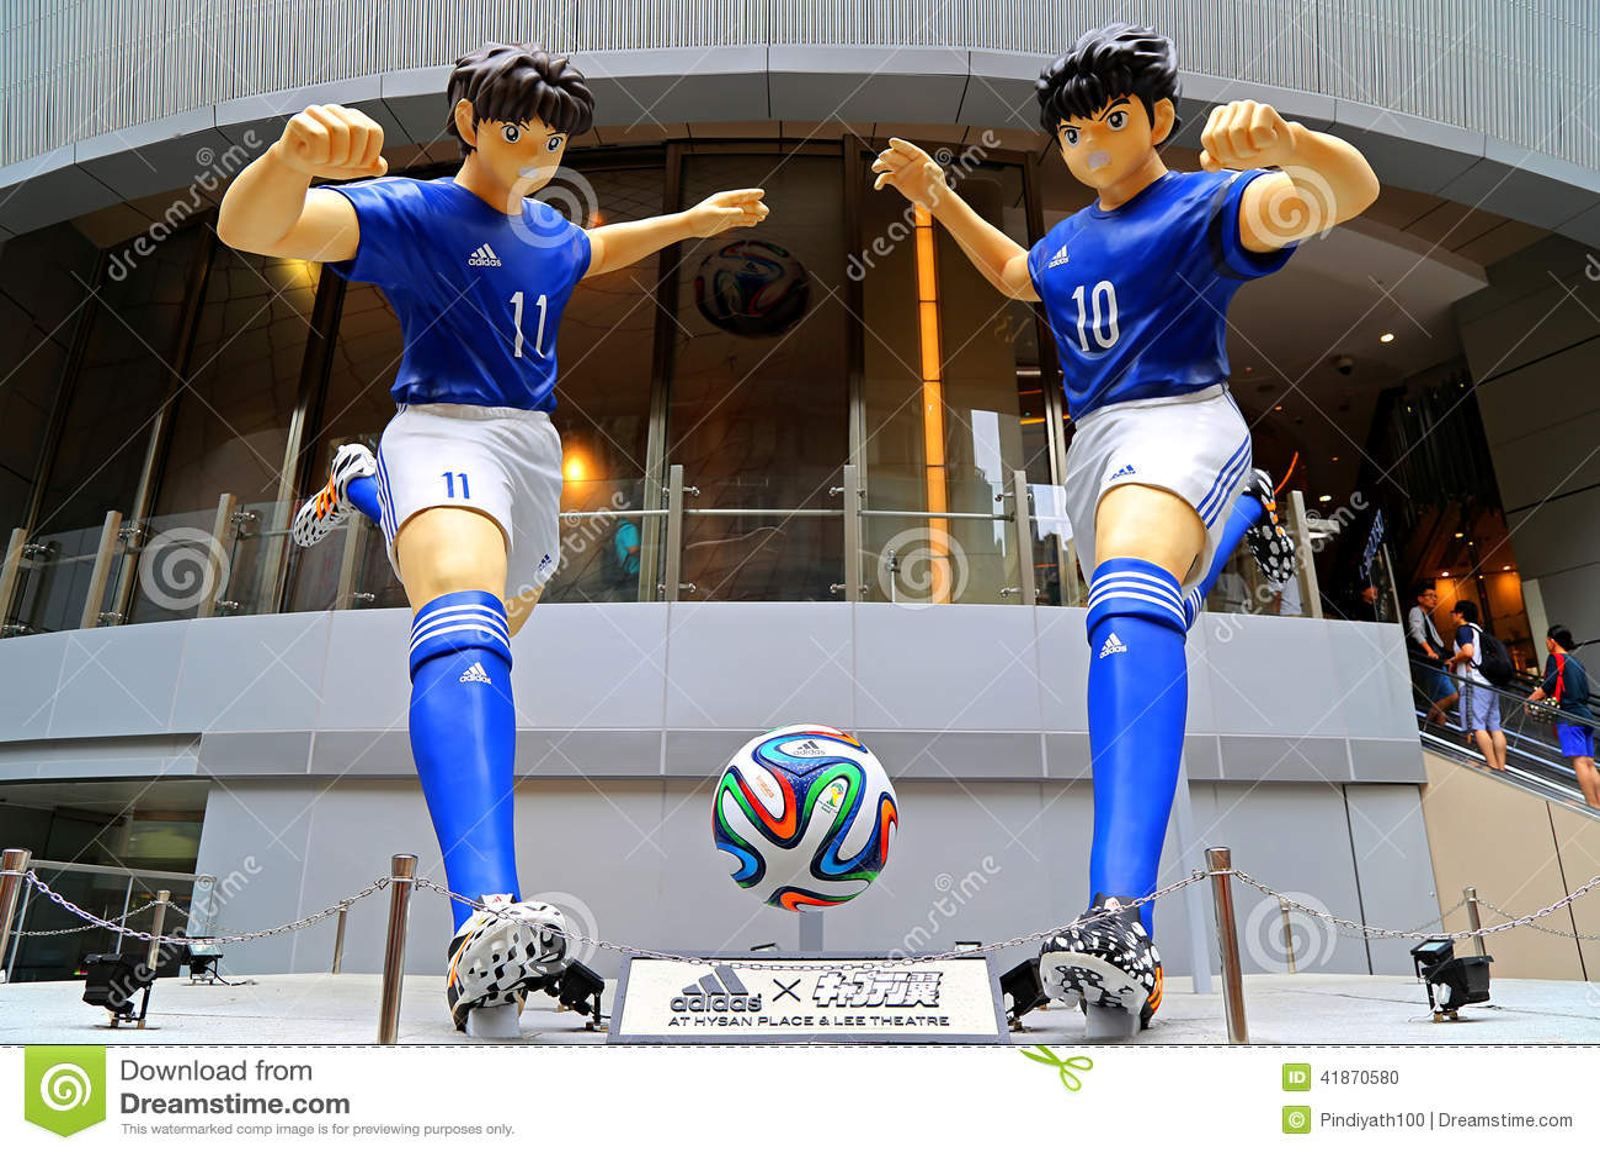 Aclarar Chimenea Monetario  Adidas World Cup Football Exhibits In Hong Kong Editorial Image - Image of  toys, asia: 41870580